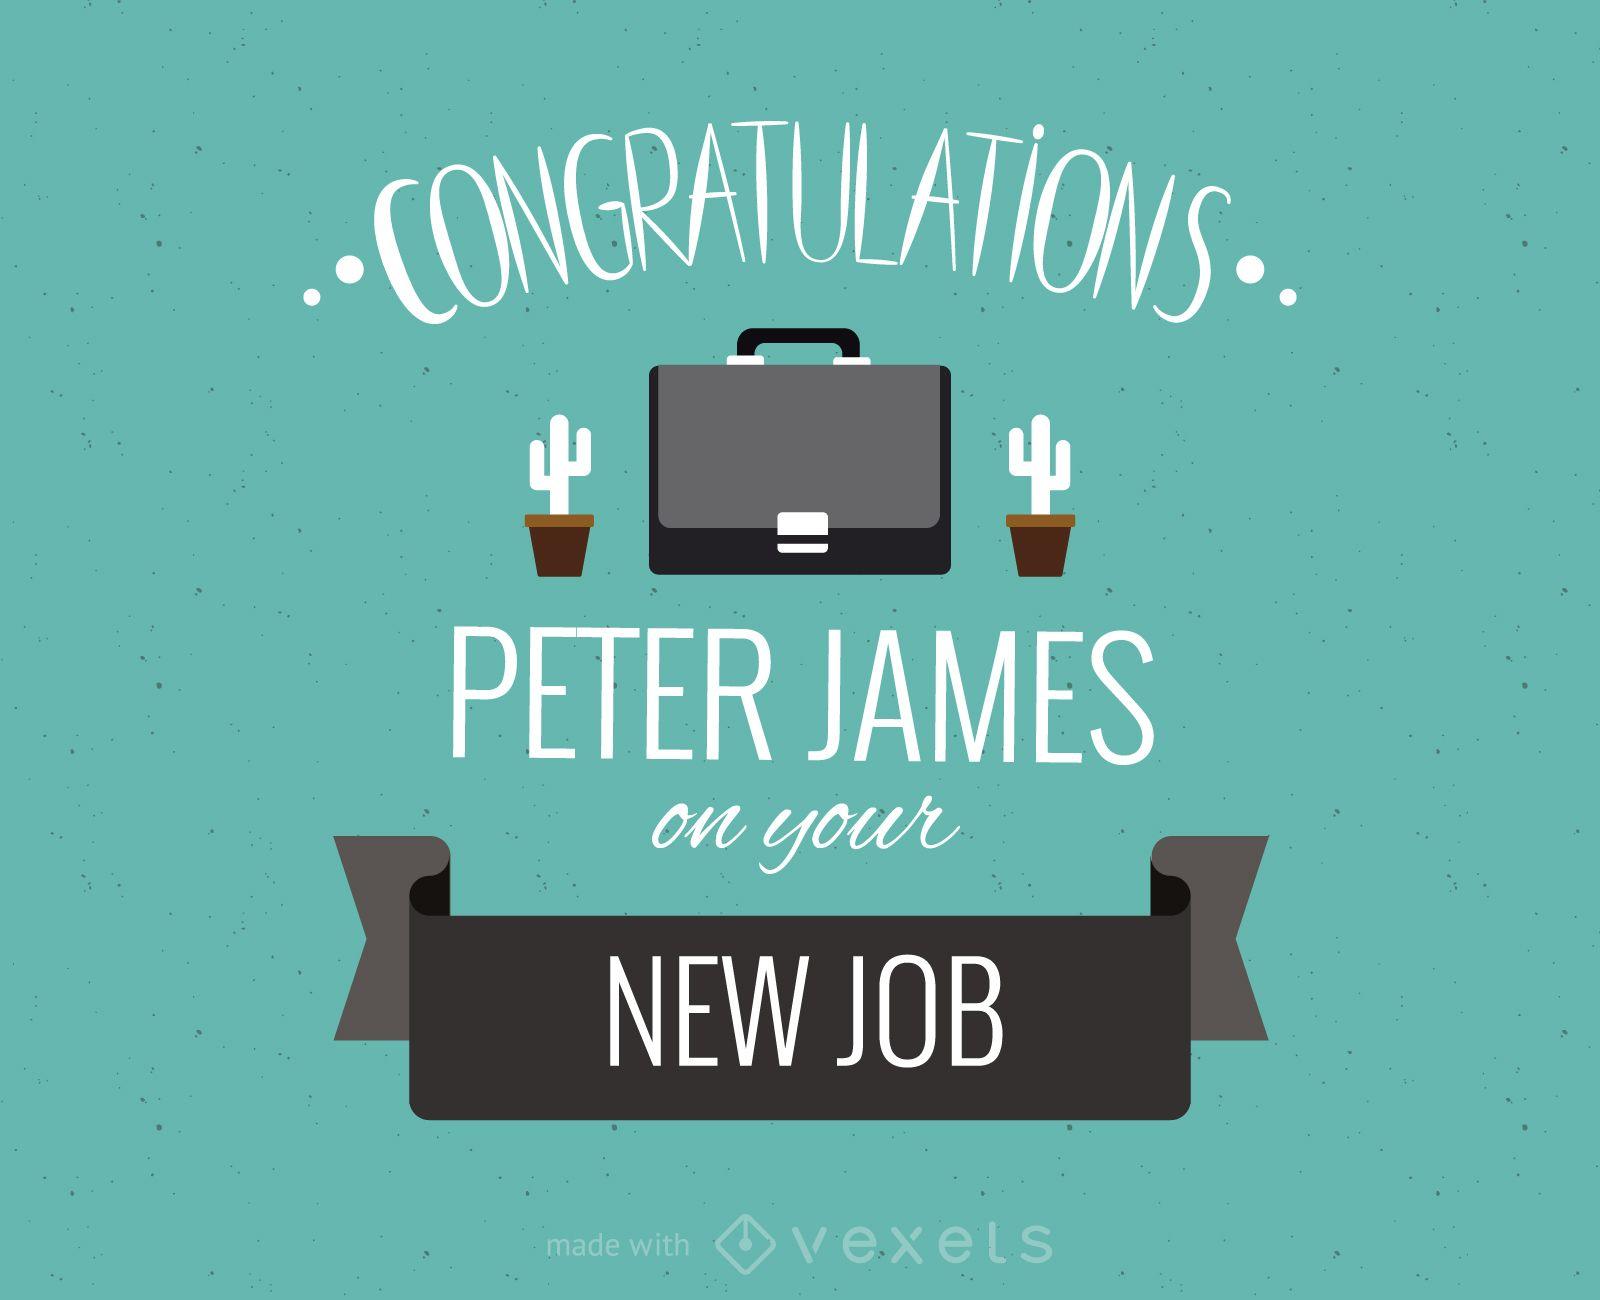 New job greeting card maker